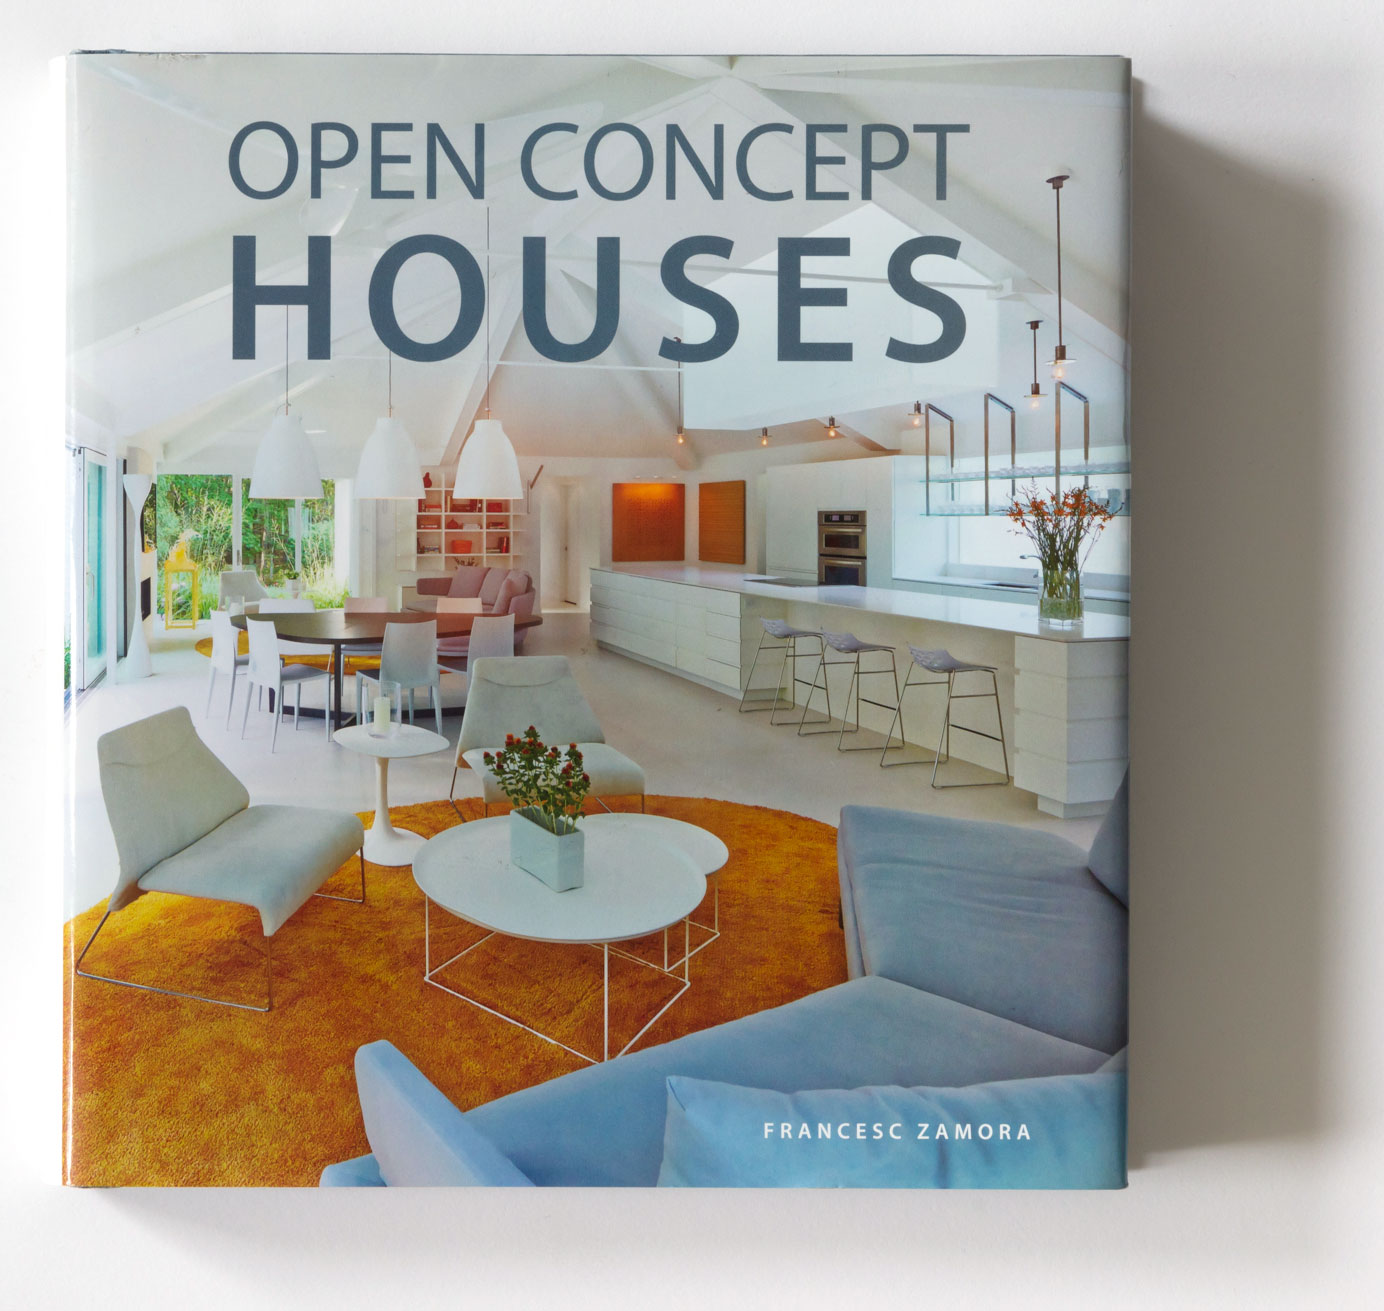 OPEN CONCEPT HOUSES - FRANCESC ZAMORA - HARPER COLLINS_2018 1